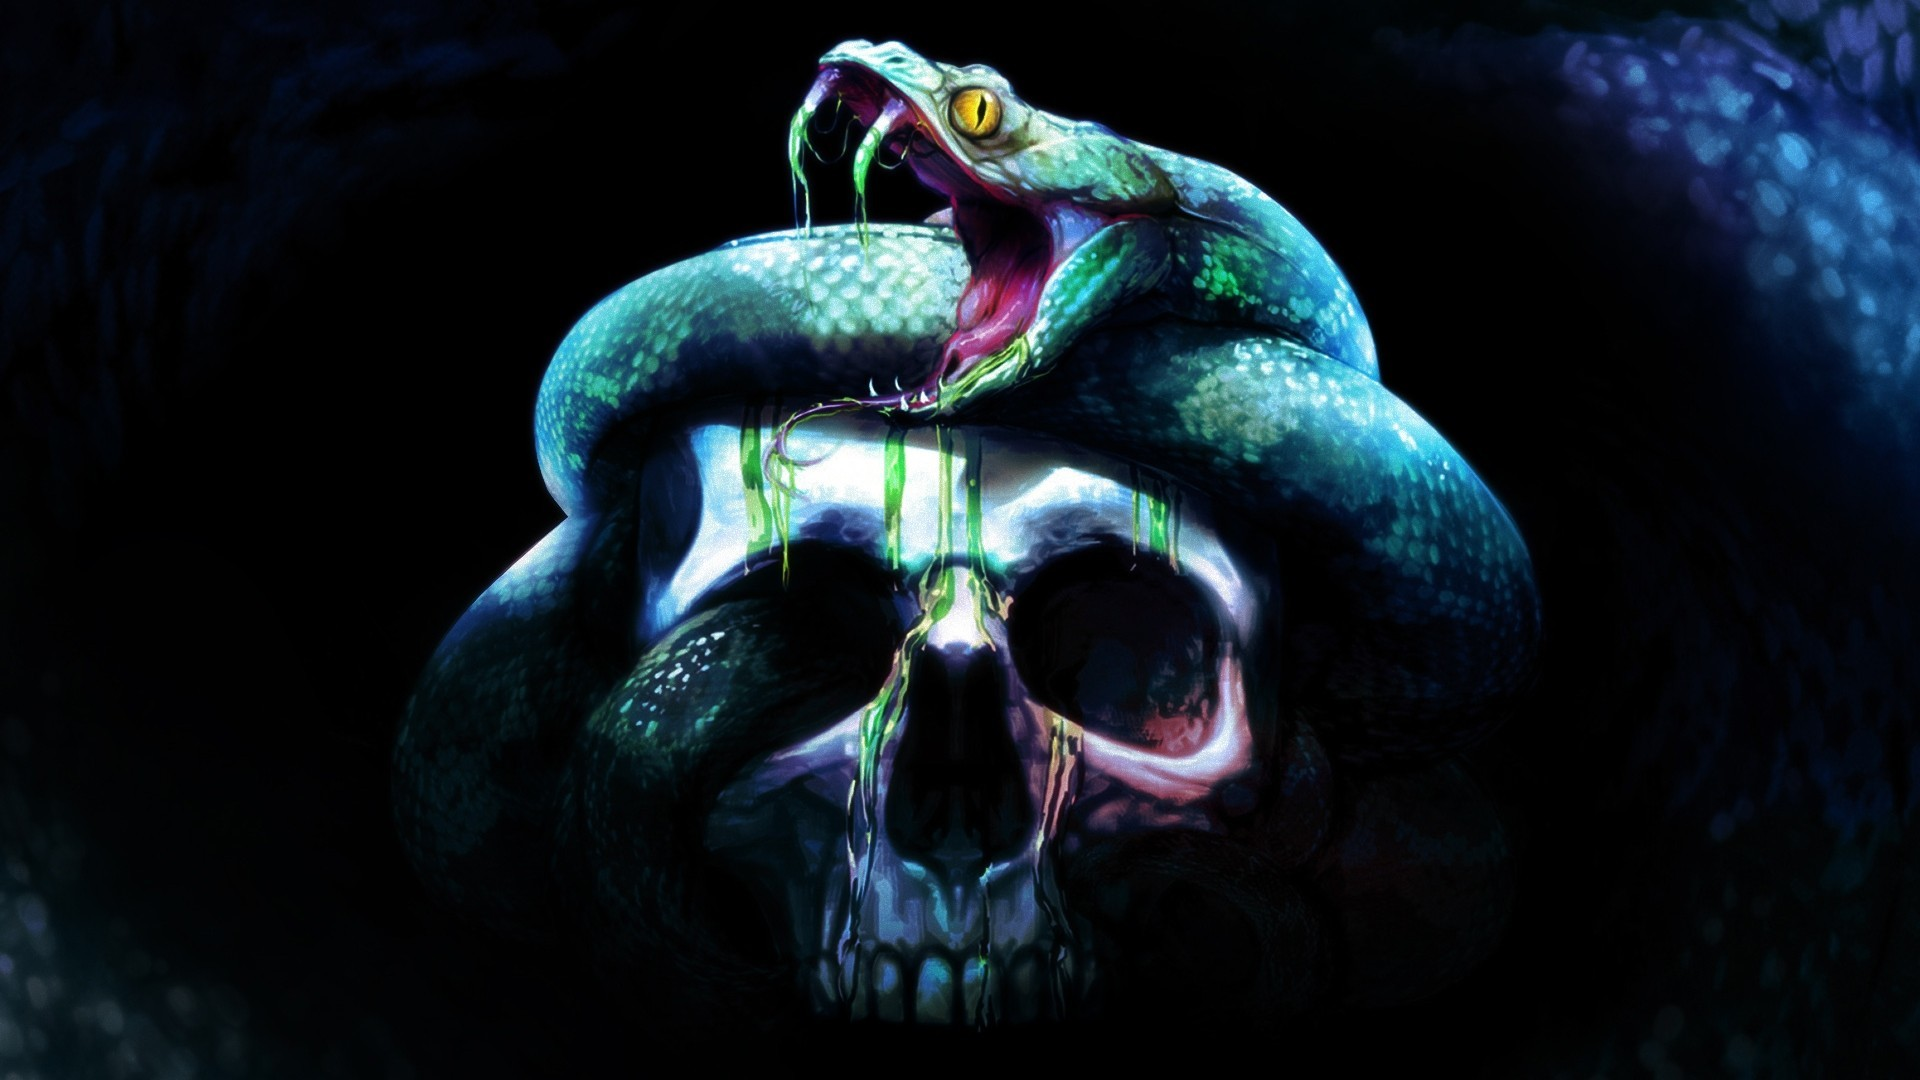 Wallpaper skull skull fear snake background wallpapers miscellanea 1920x1080